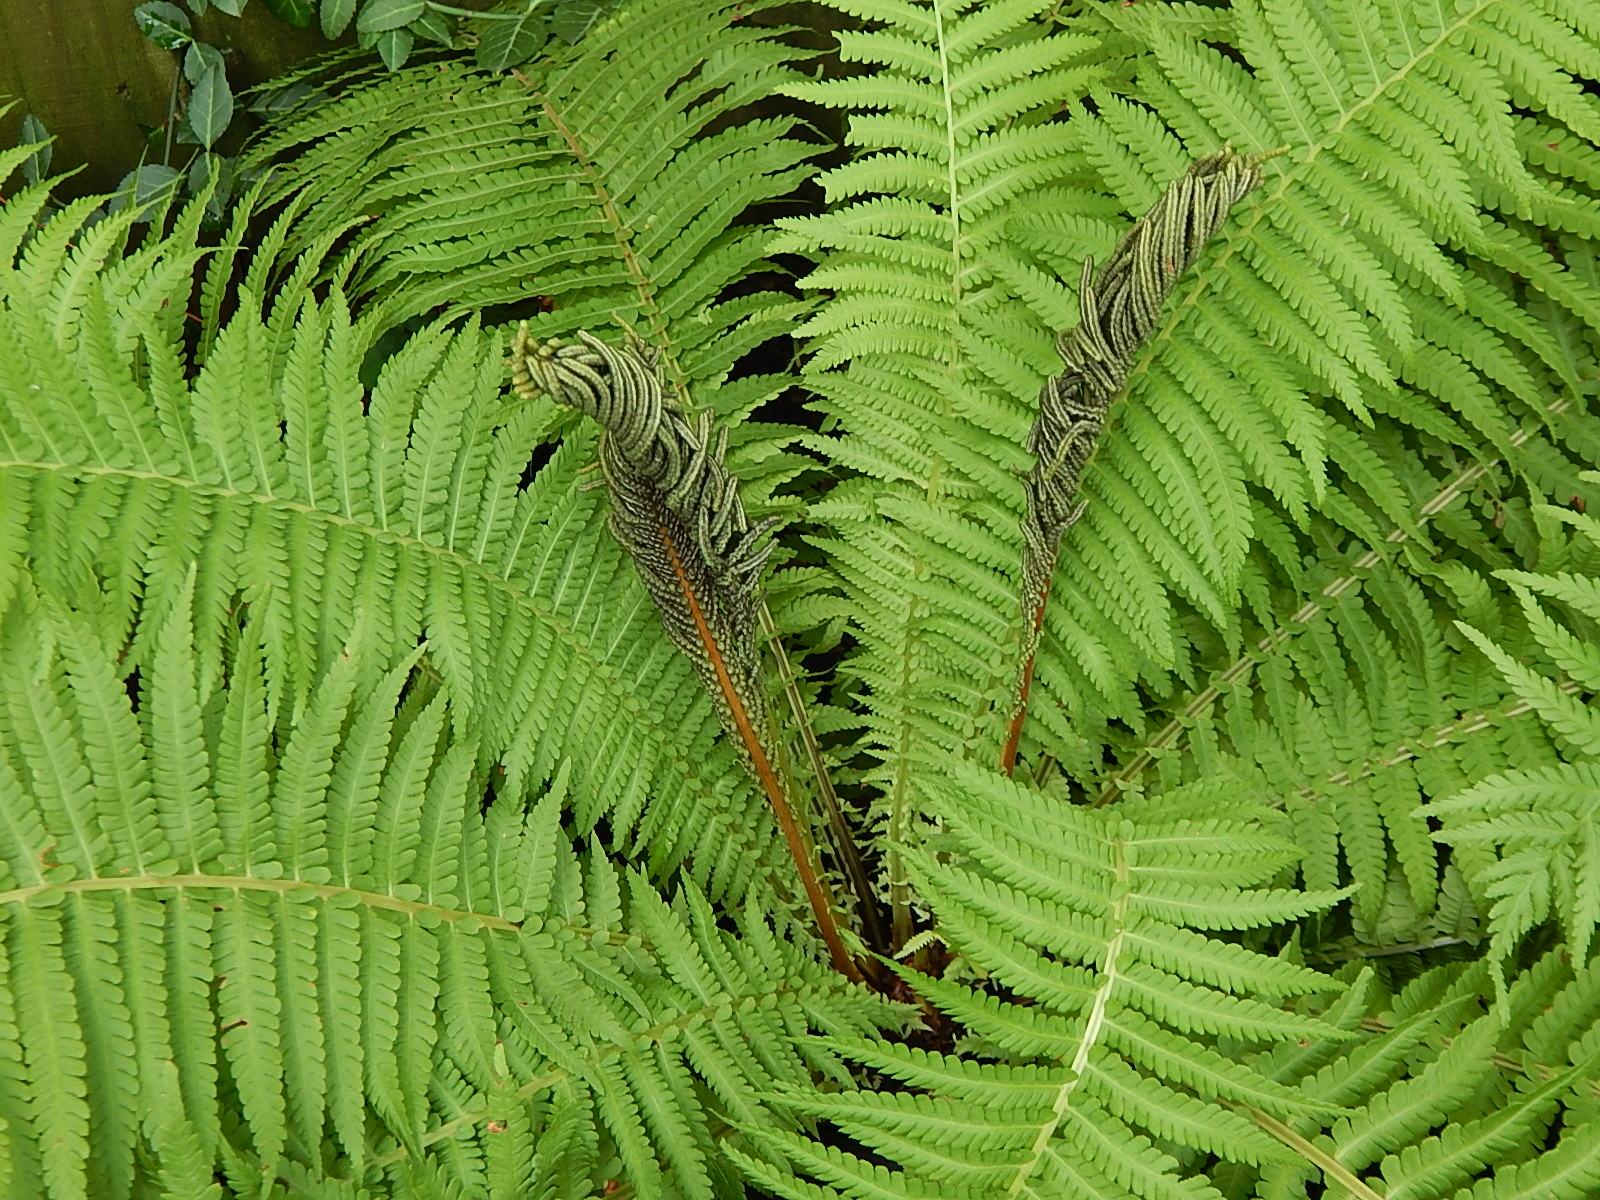 Ostrich fern fertile frond